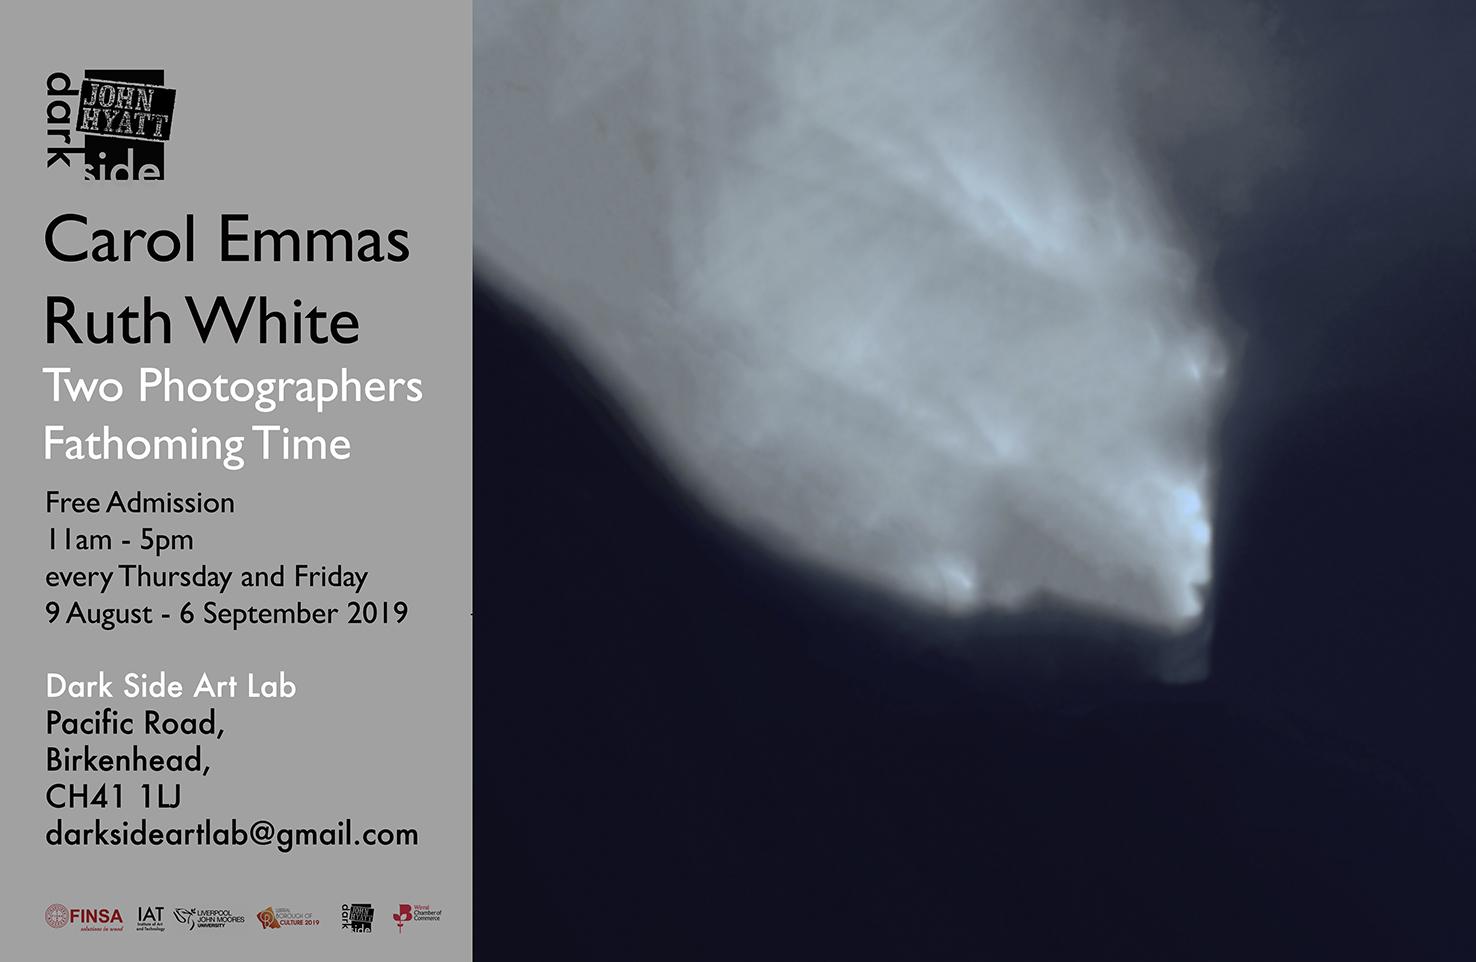 Dark Side Art Lab: Carol Emmas and Ruth White: Two Photographers Fathoming Time